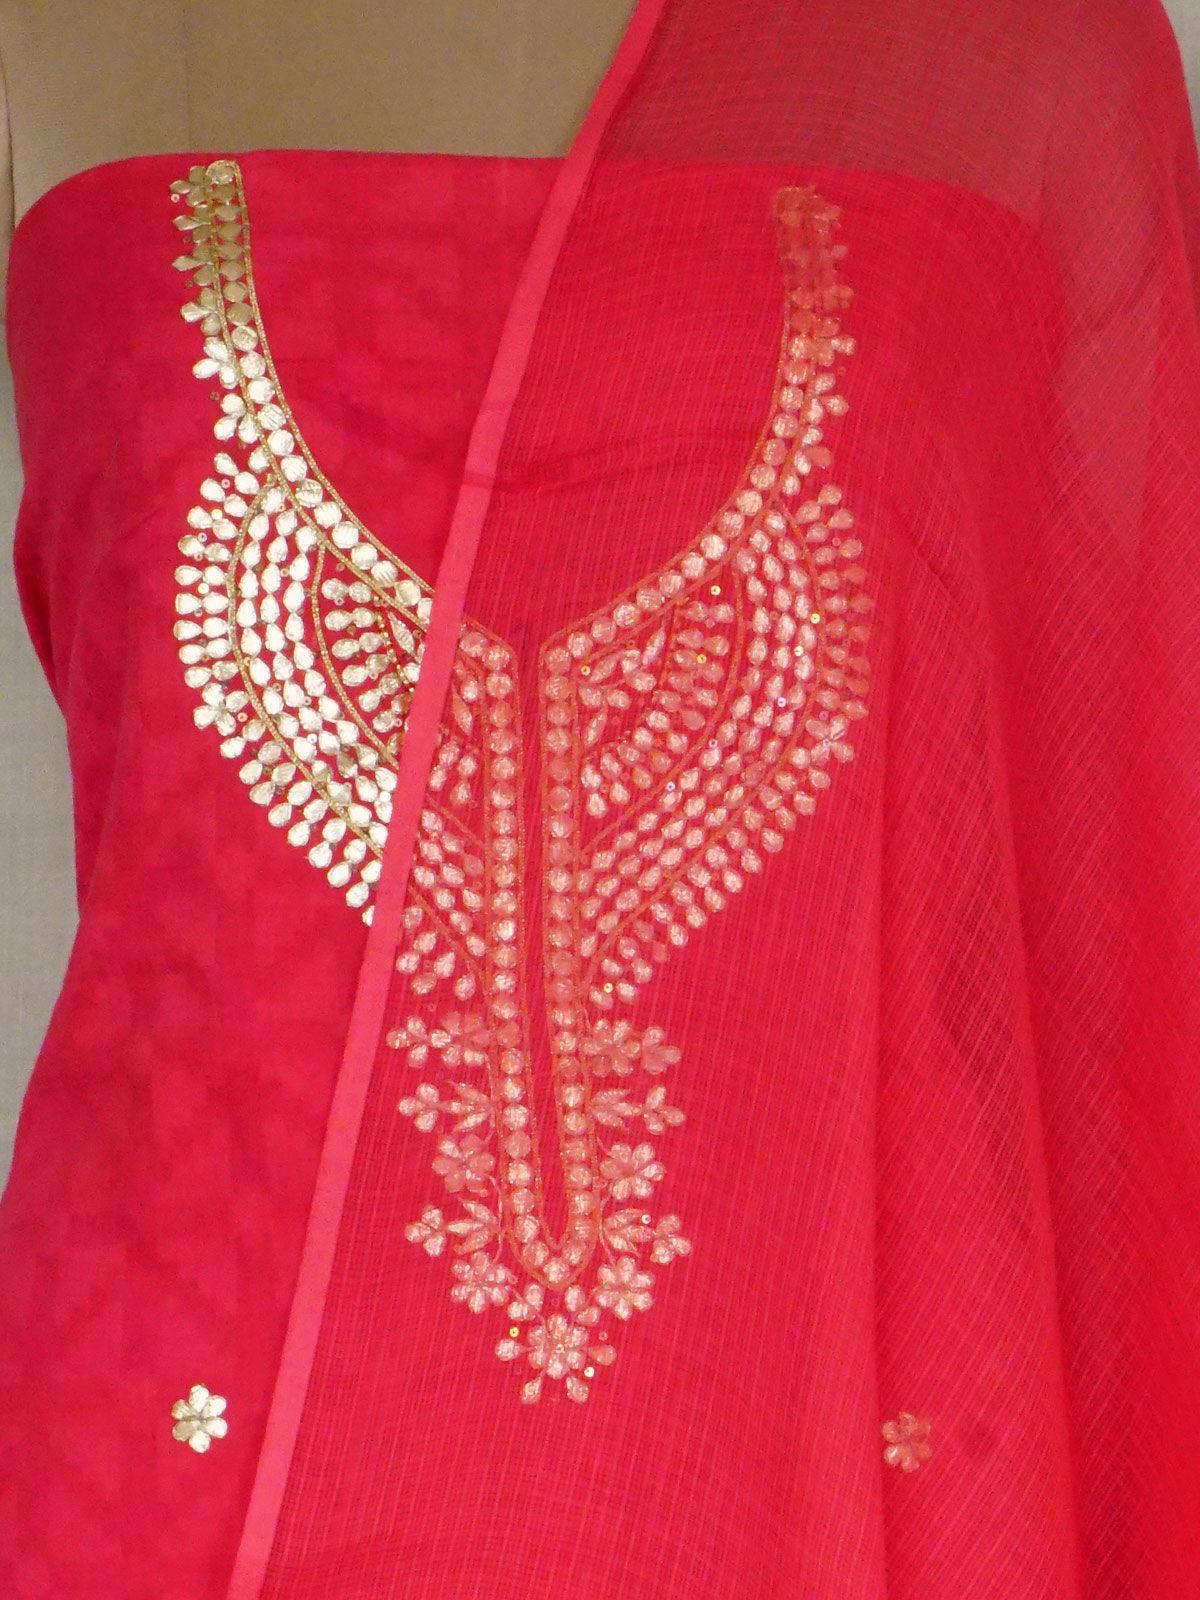 Cotton fabric kurta with gota patti work with cotton kota dupatta.